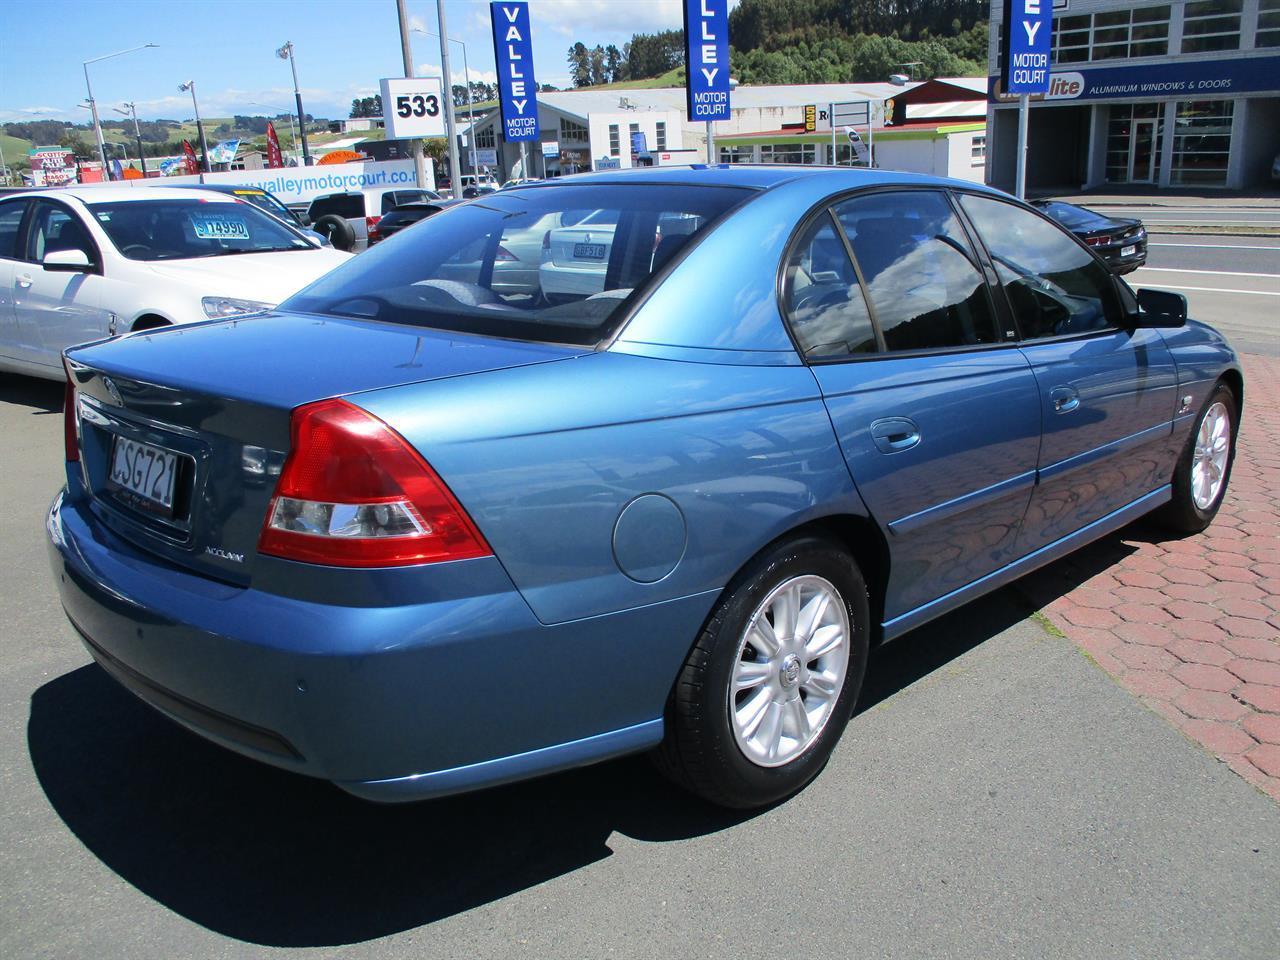 image-3, 2005 Holden Commodore VZ Acclaim at Dunedin